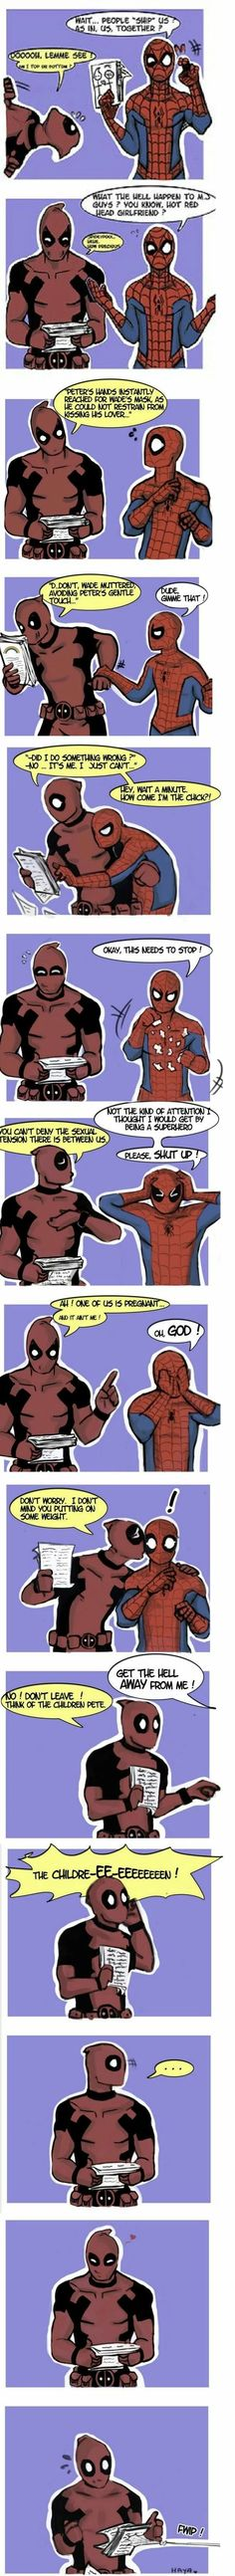 Some more Deadpool funnies - Imgur